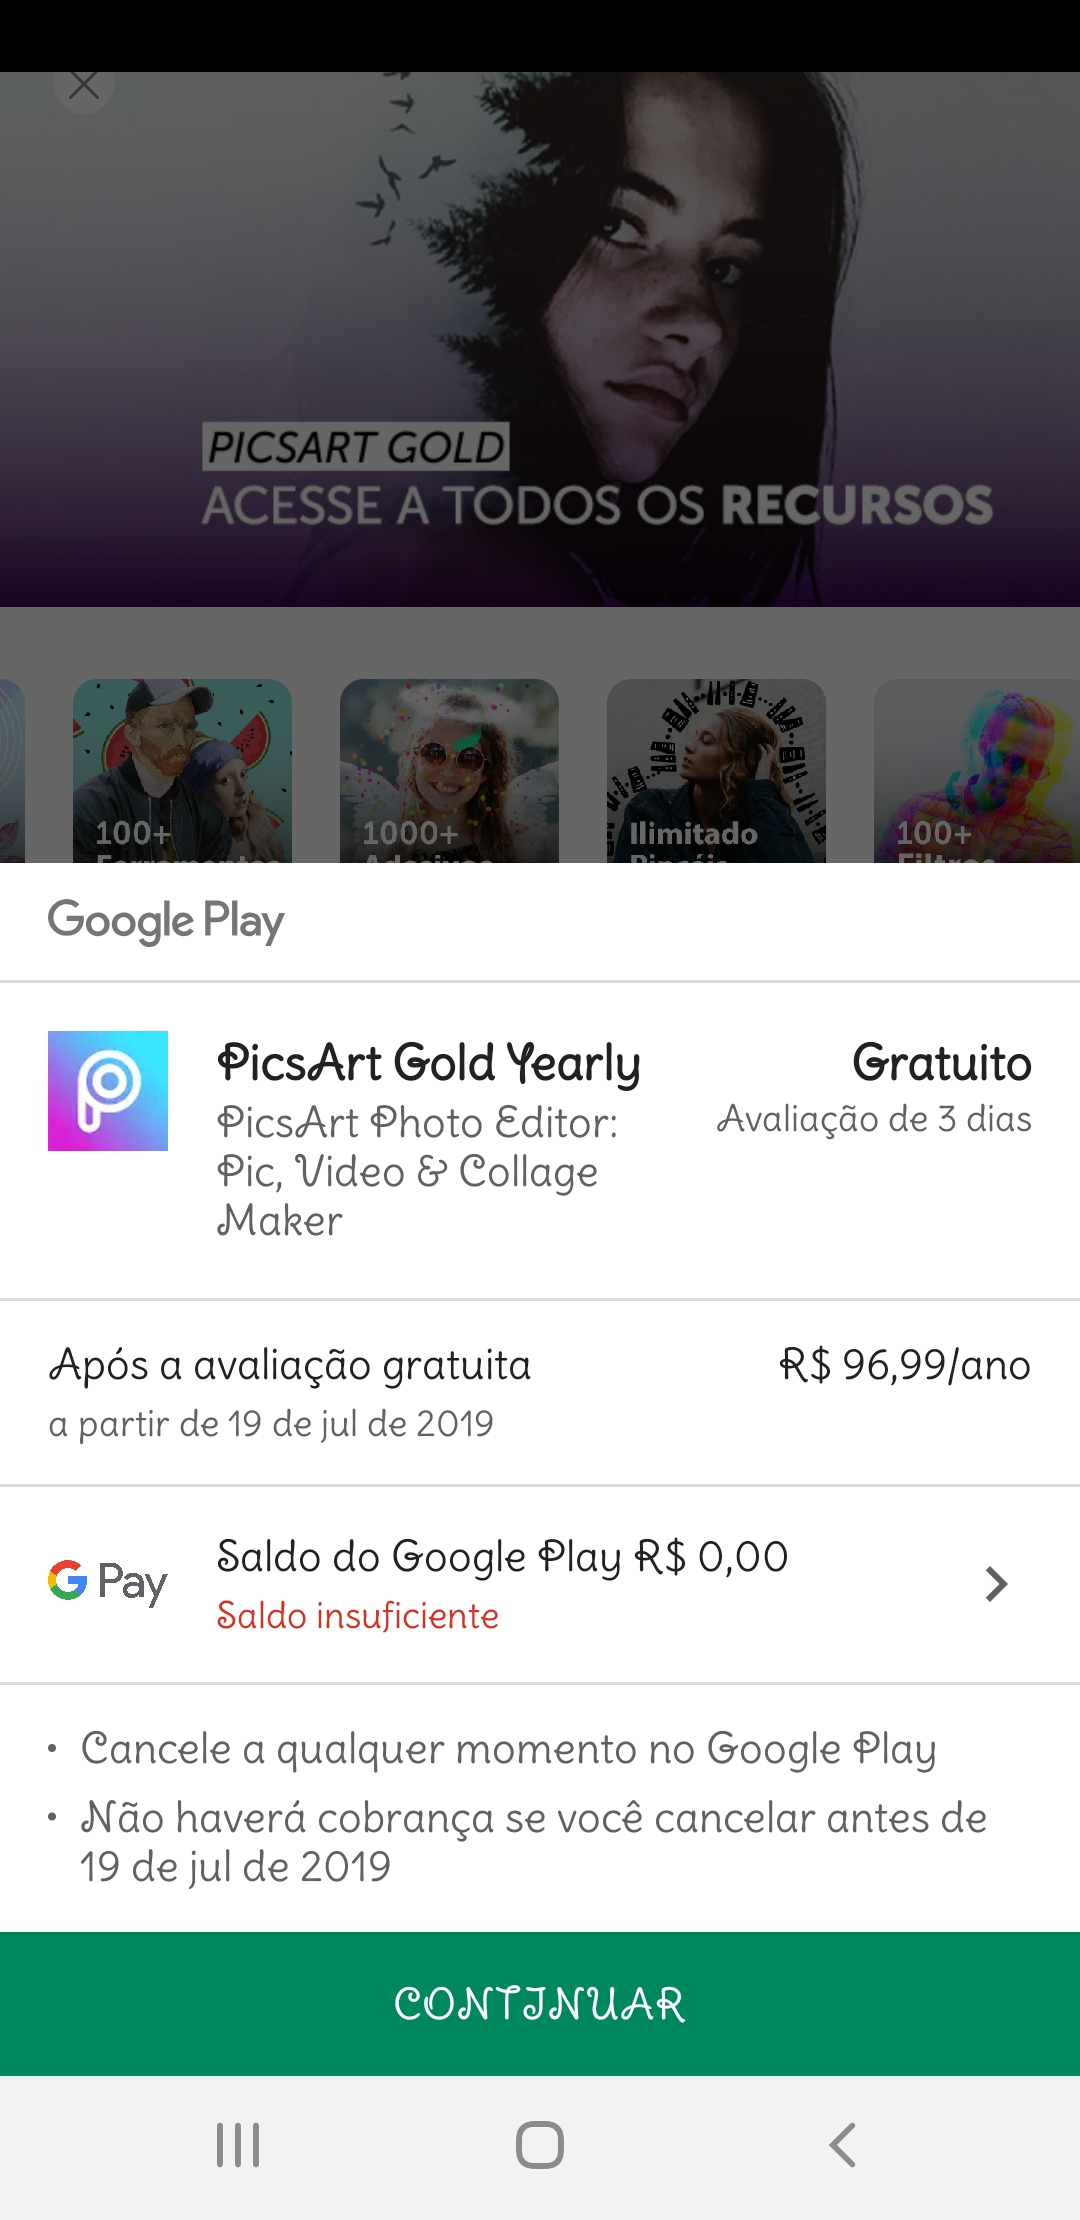 Nao Consigo Trocar De Conta Para Realizar Pagamentos Google Play